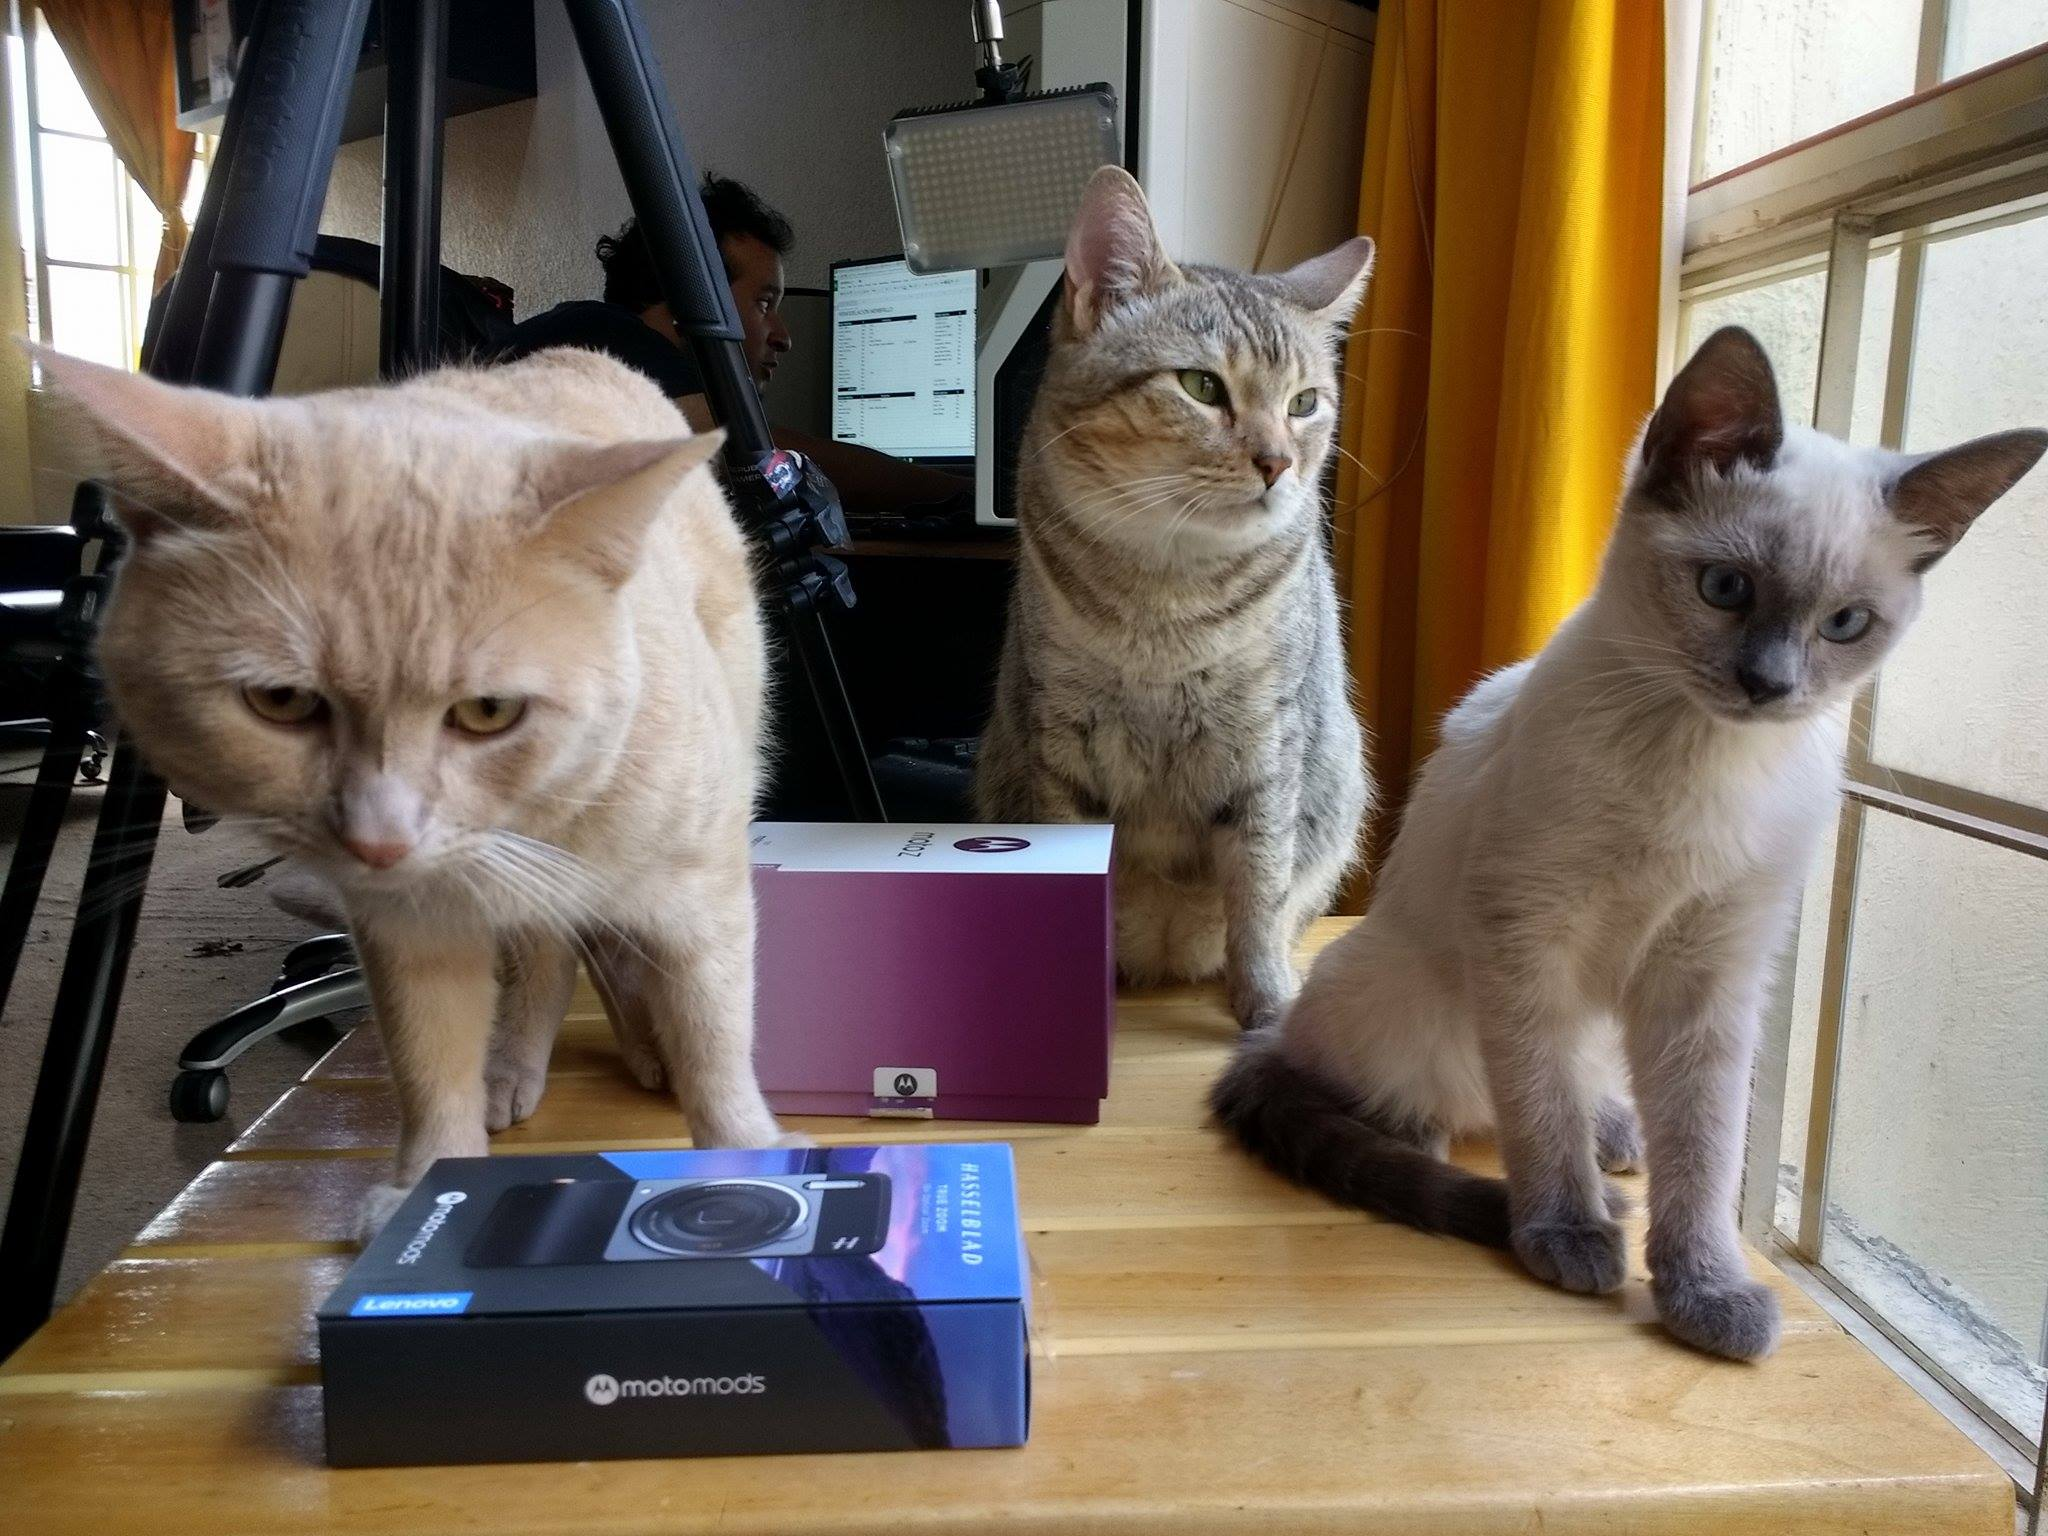 pingo-wero-isis-familia felina-poderpda